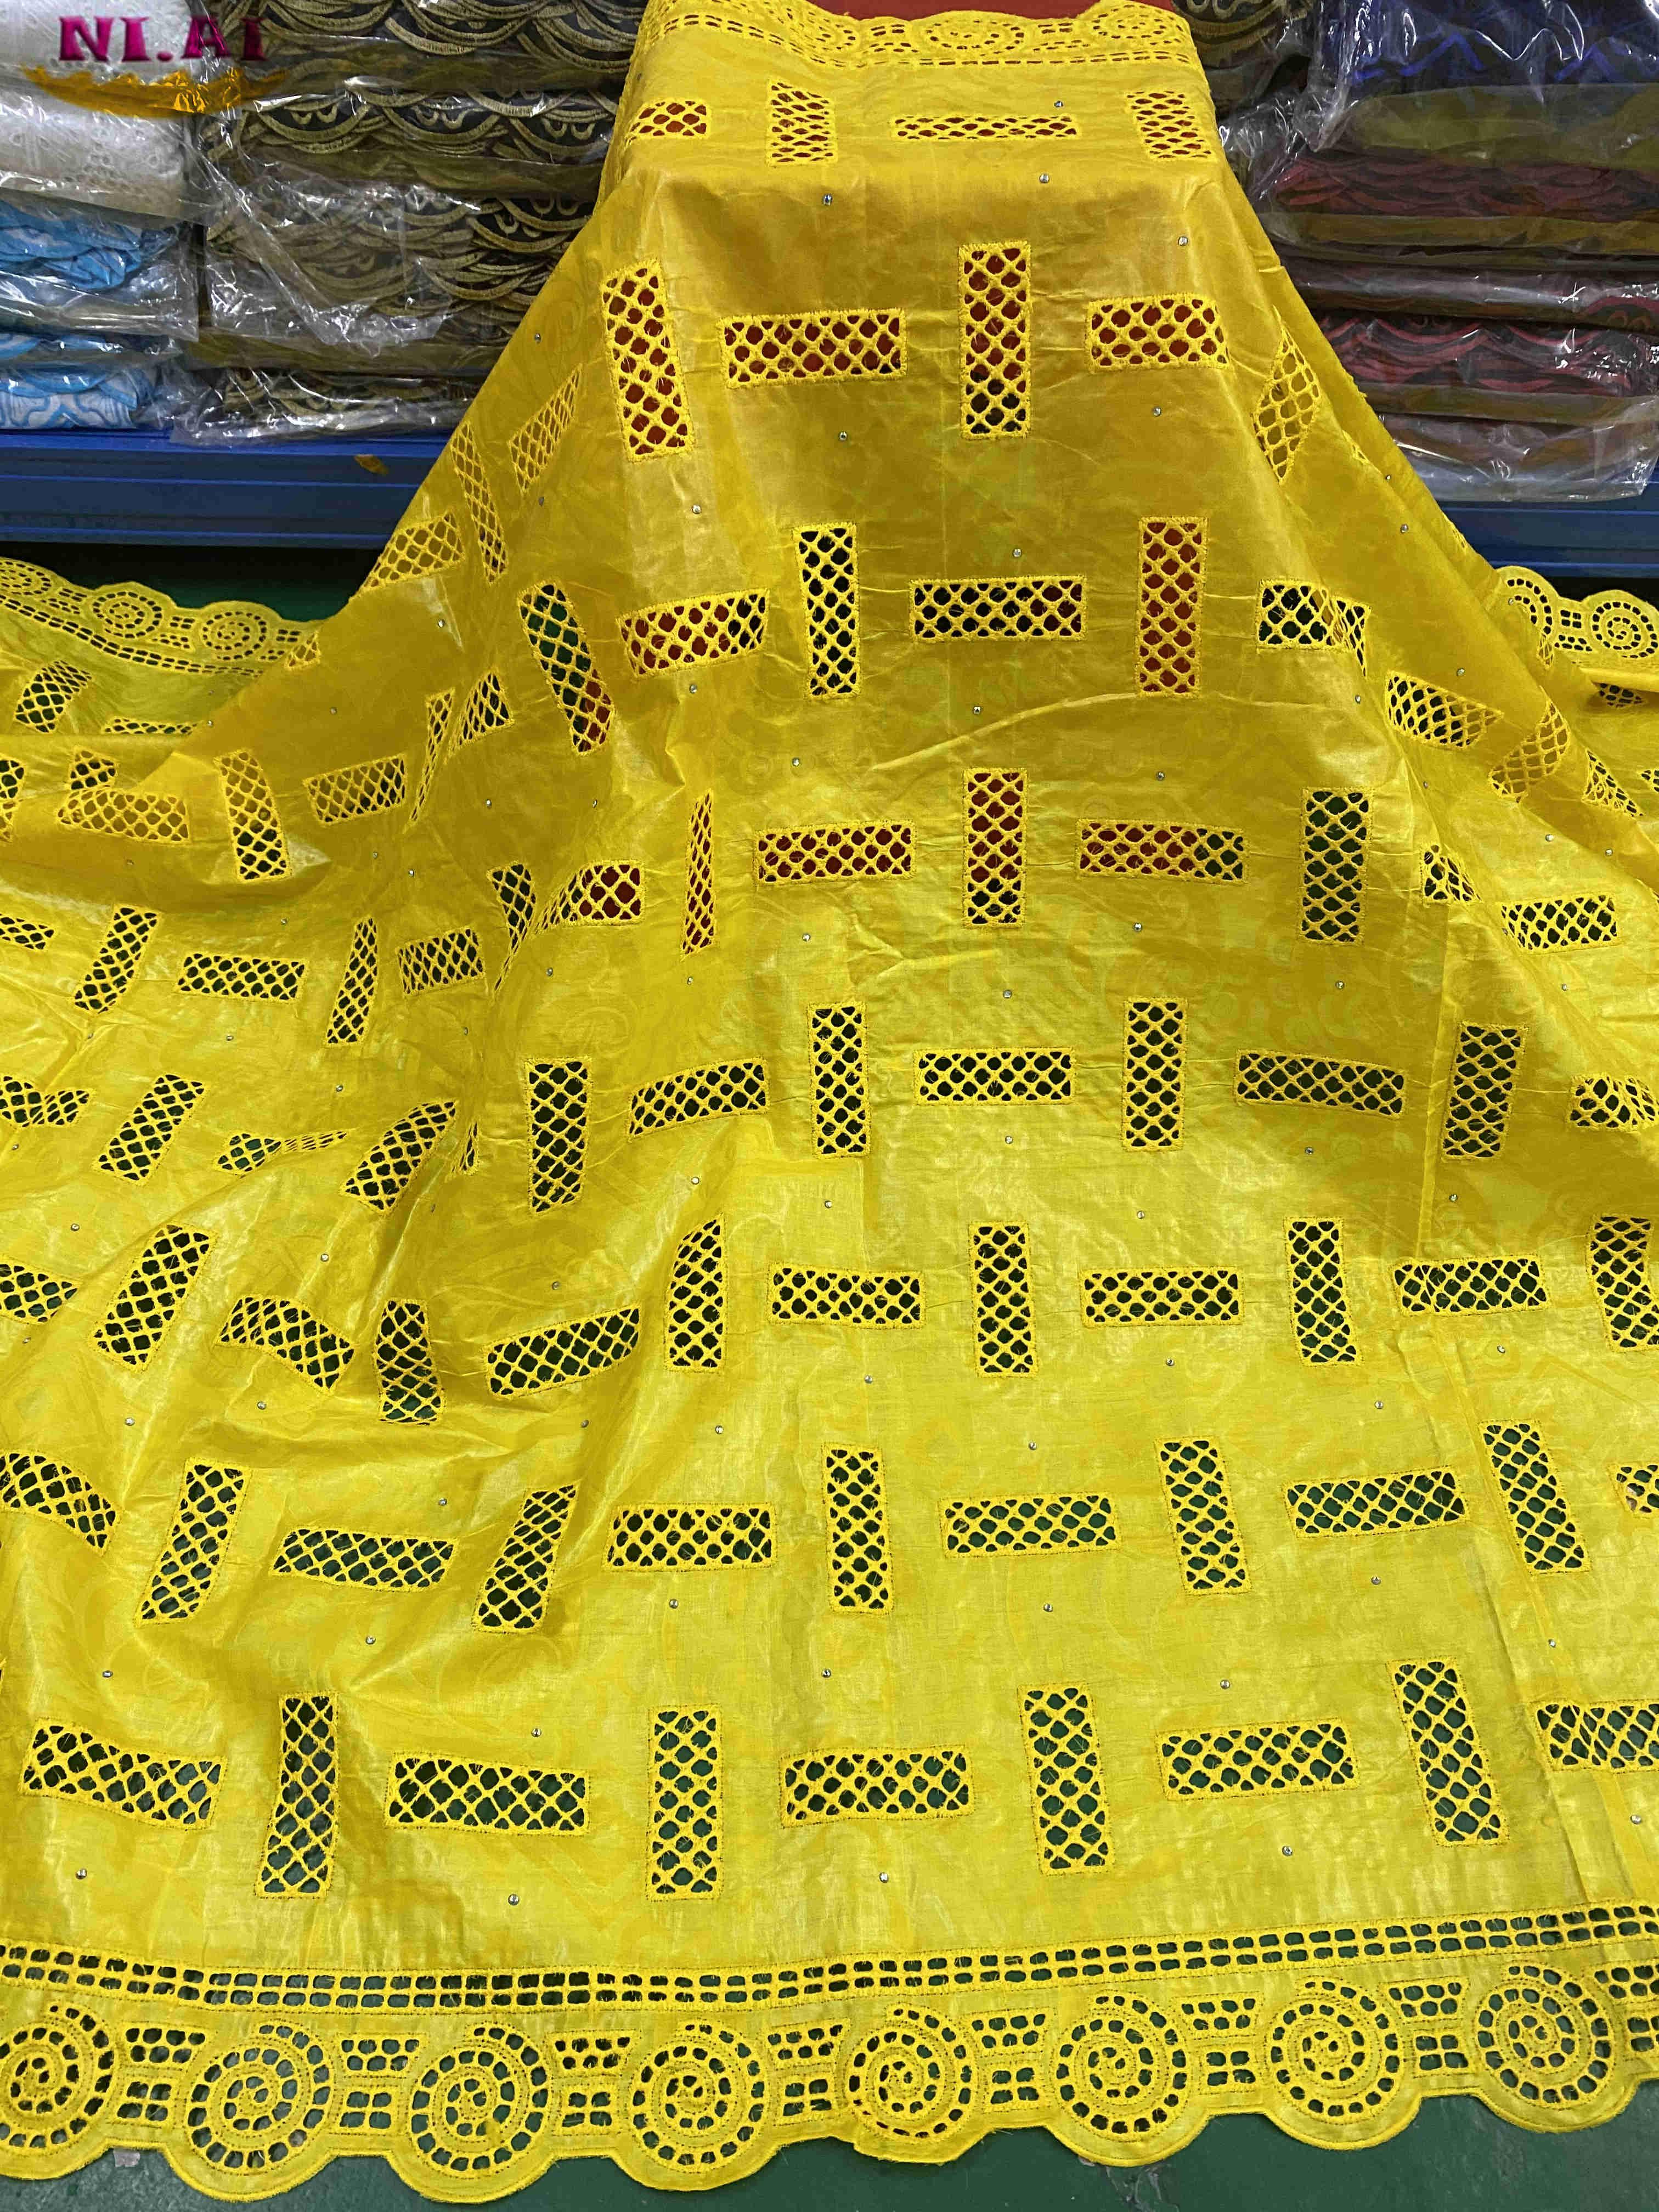 NIAI بازان الثراء Getzner النسيج الأفريقي الدانتيل النسيج 2020 عالية الجودة Brode القطن النيجيري أقمشة الدانتيل لفستان XY3348B-2